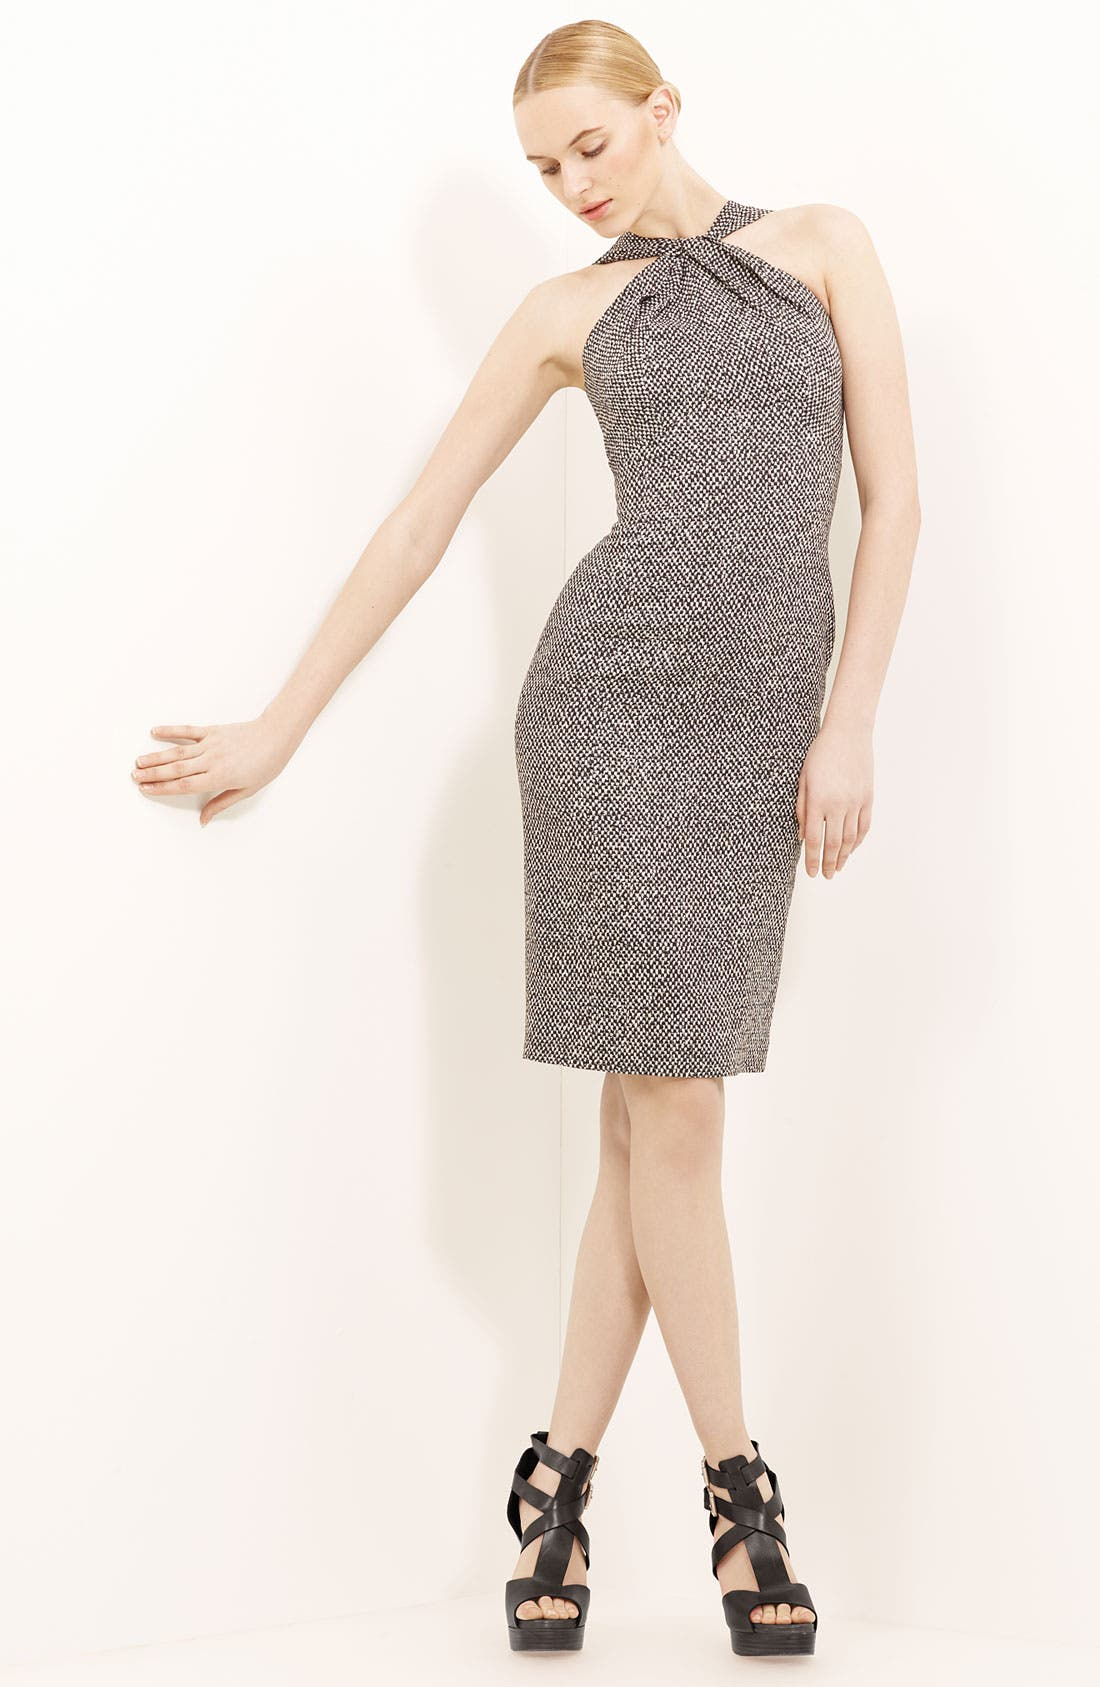 Alternate Image 1 Selected - Michael Kors Tweed Print Cady Dress